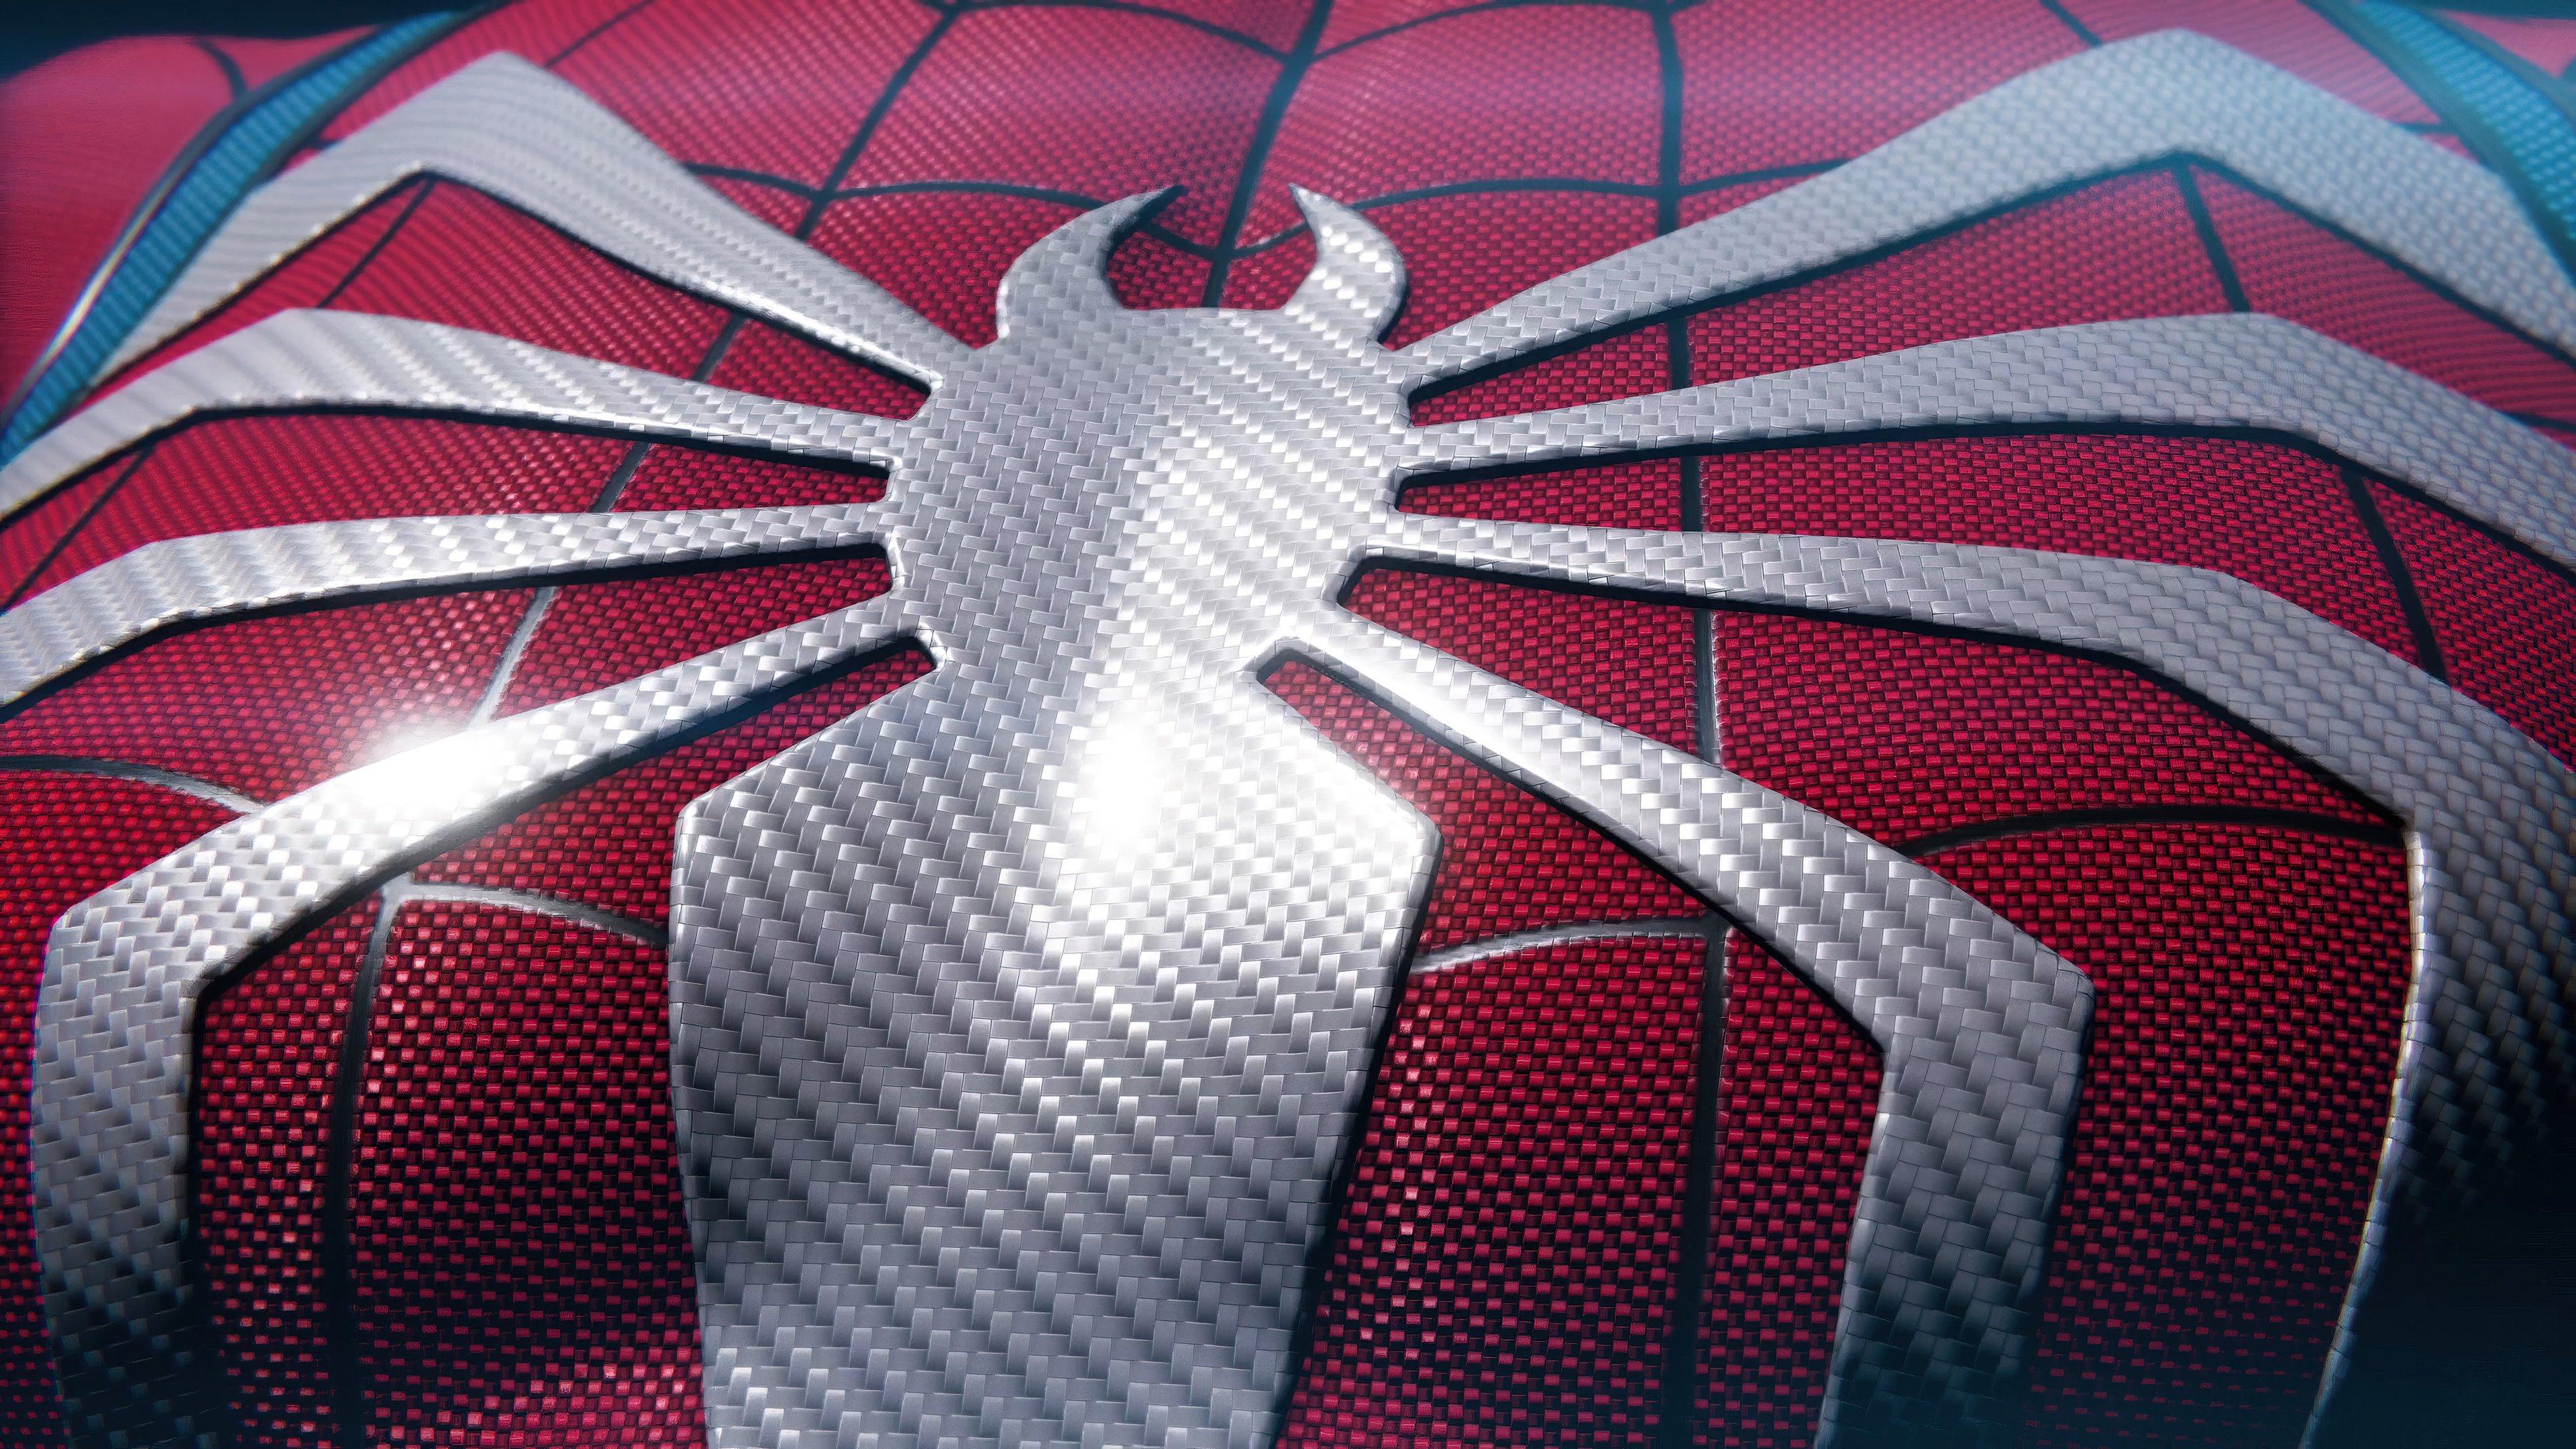 Fondos de pantalla Araña en traje rojo